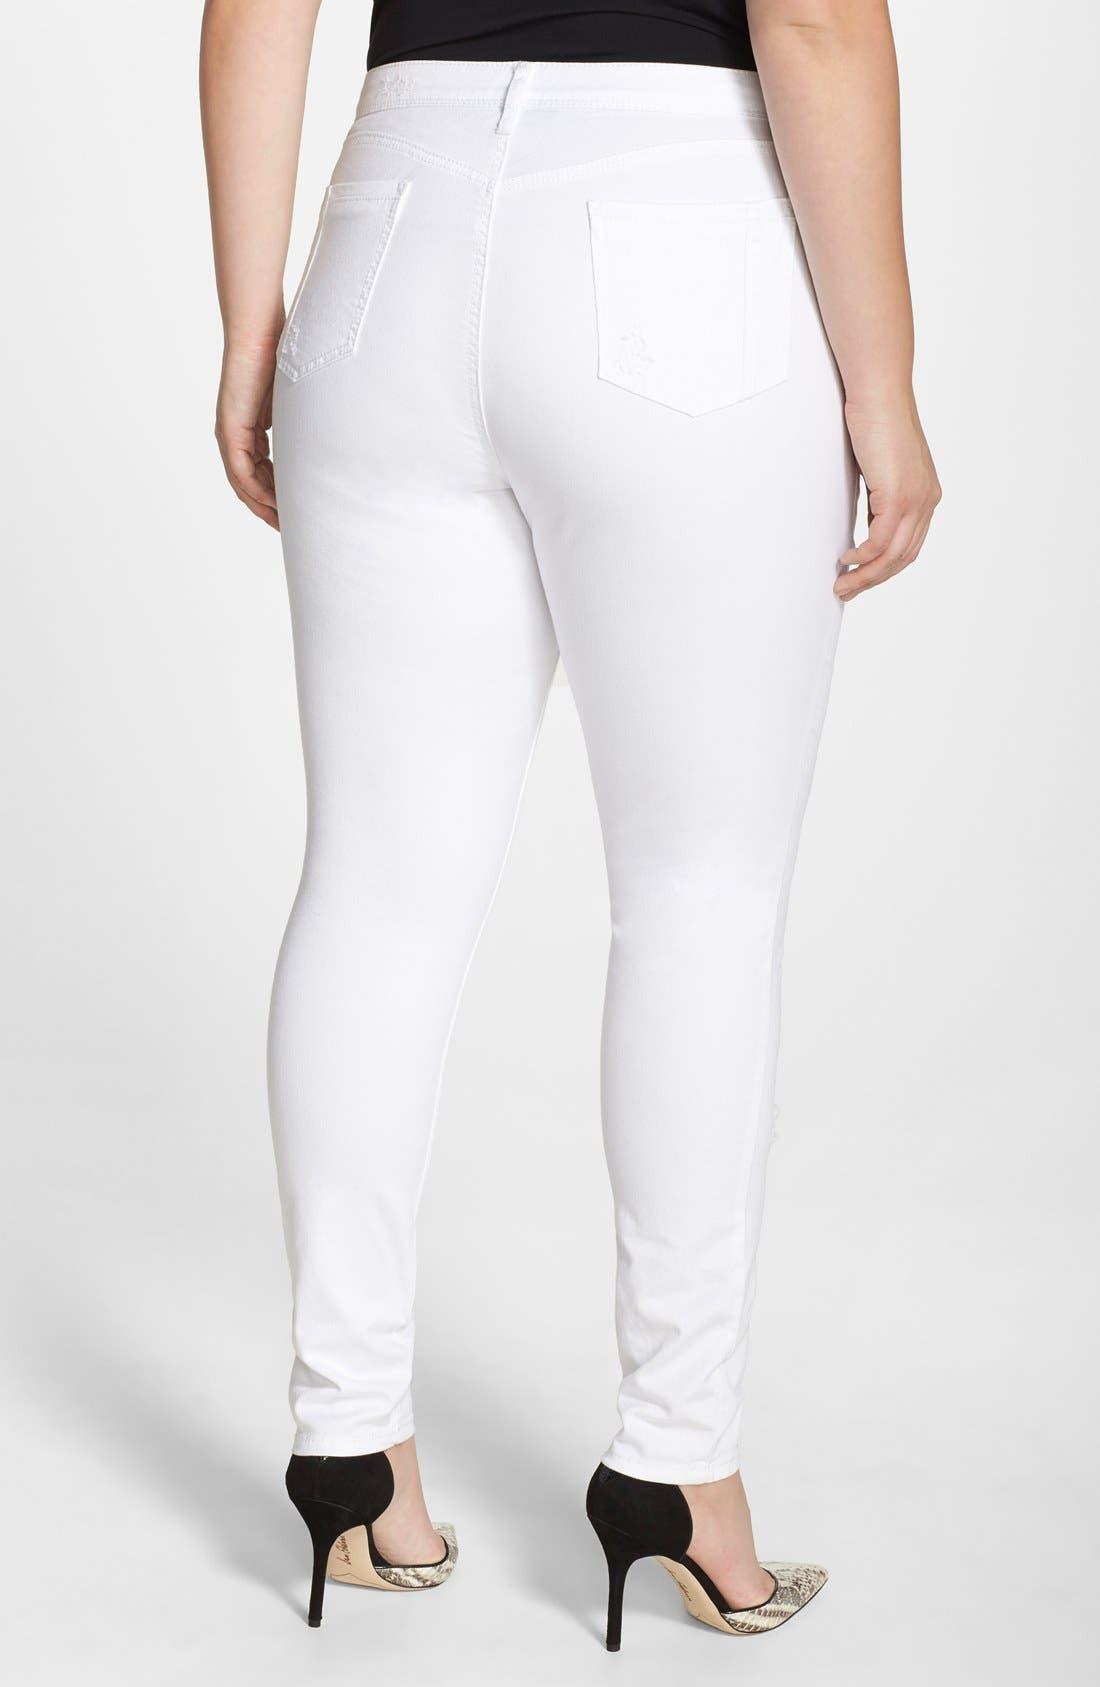 POETIC JUSTICE, 'Maya' Destroyed White Skinny Jeans, Alternate thumbnail 2, color, CASPER